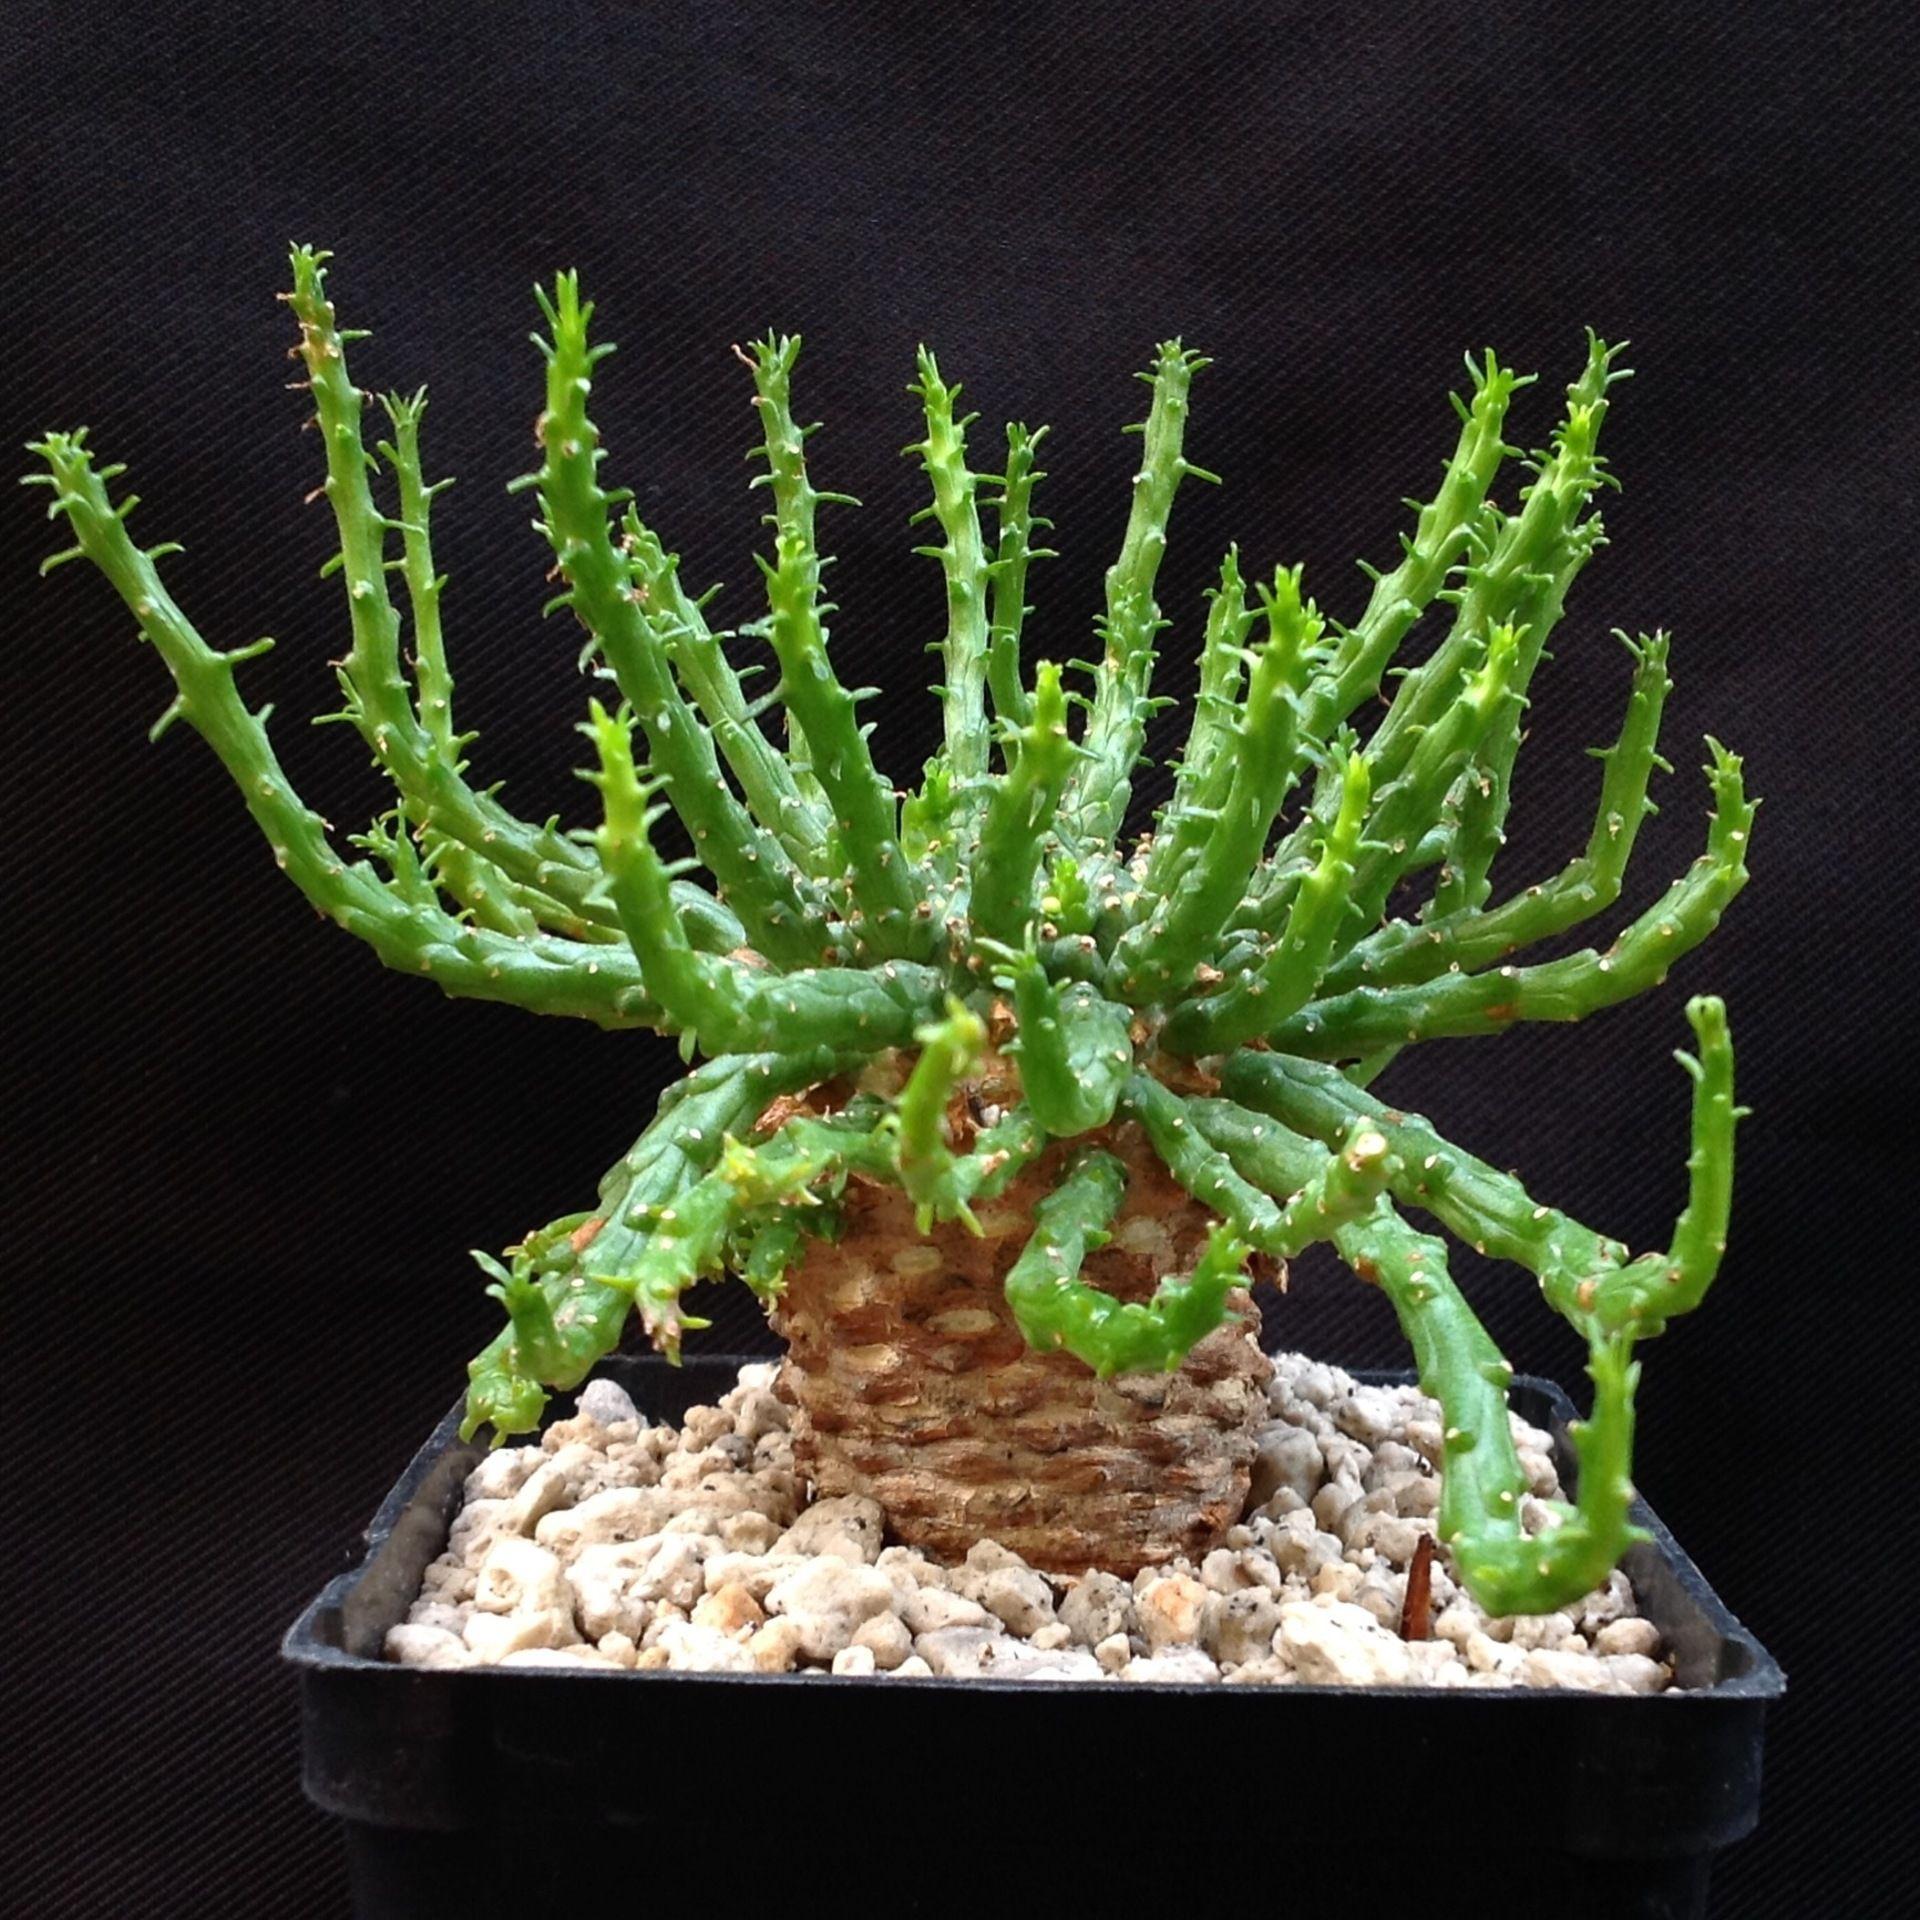 Connu Euphorbia flanaganii medusa   socalfatplants_n_more, succulent  FS78